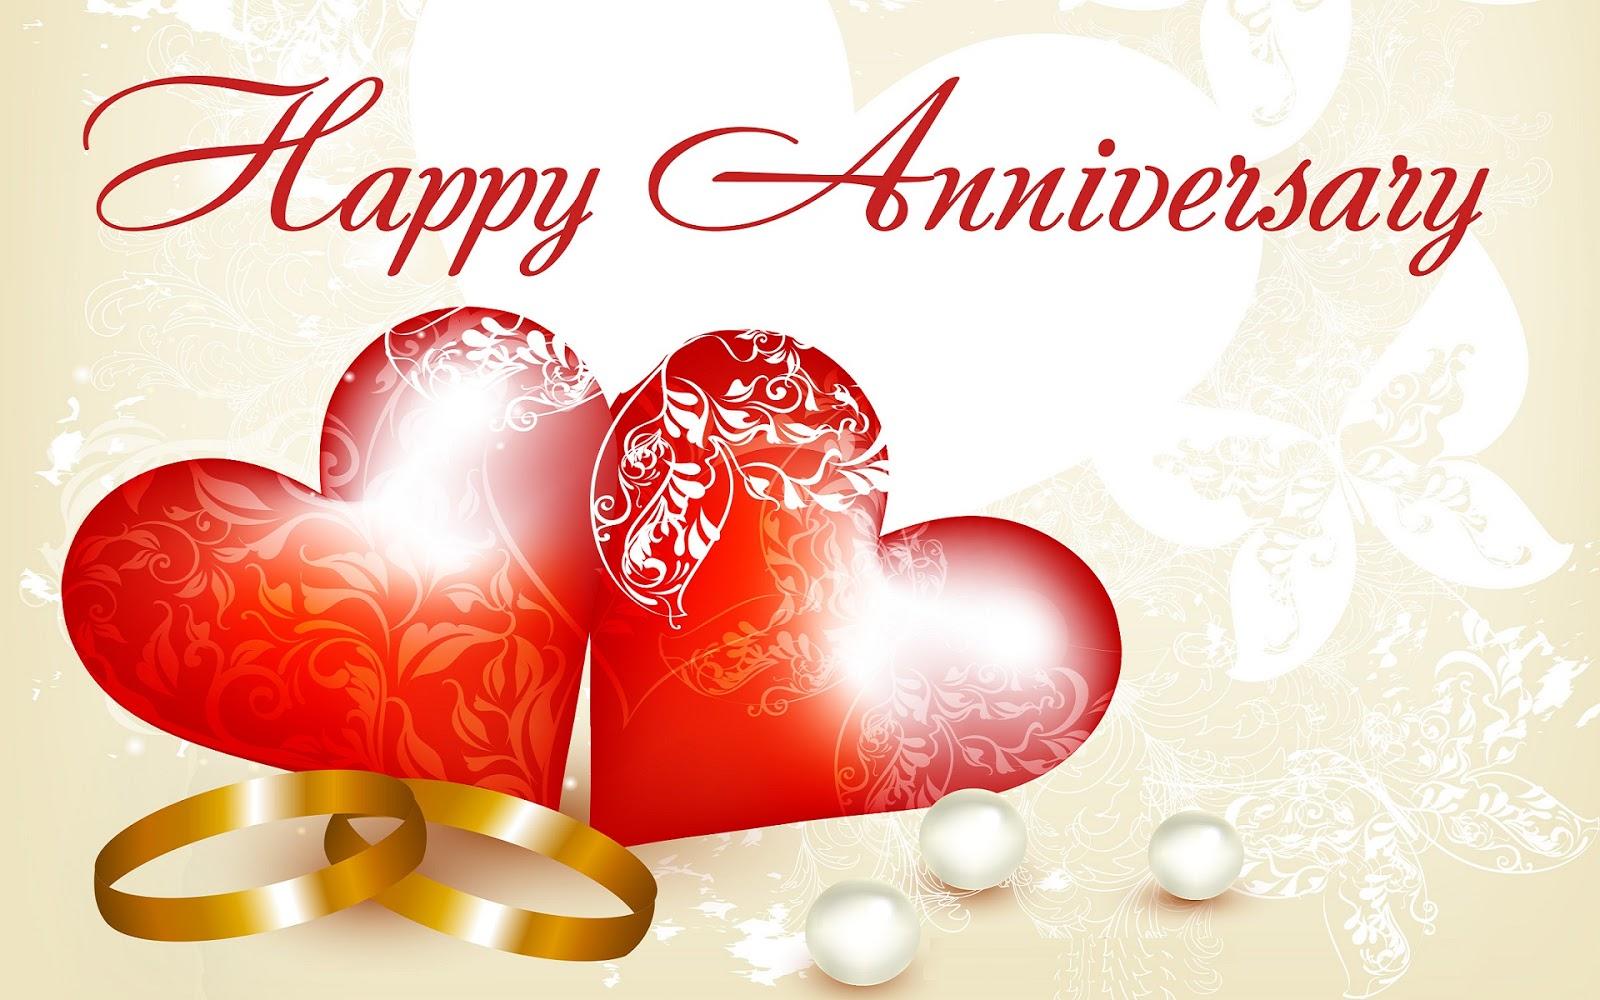 ImagesList.com: Happy Anniversary 7